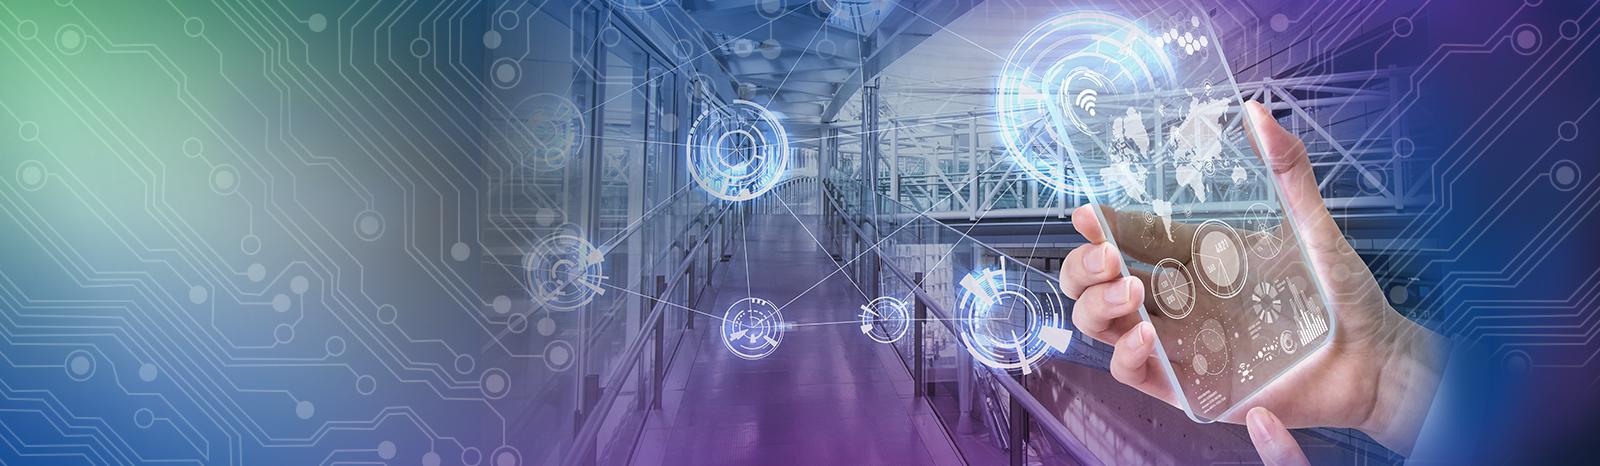 Designing-IoT-Sensor-Networks